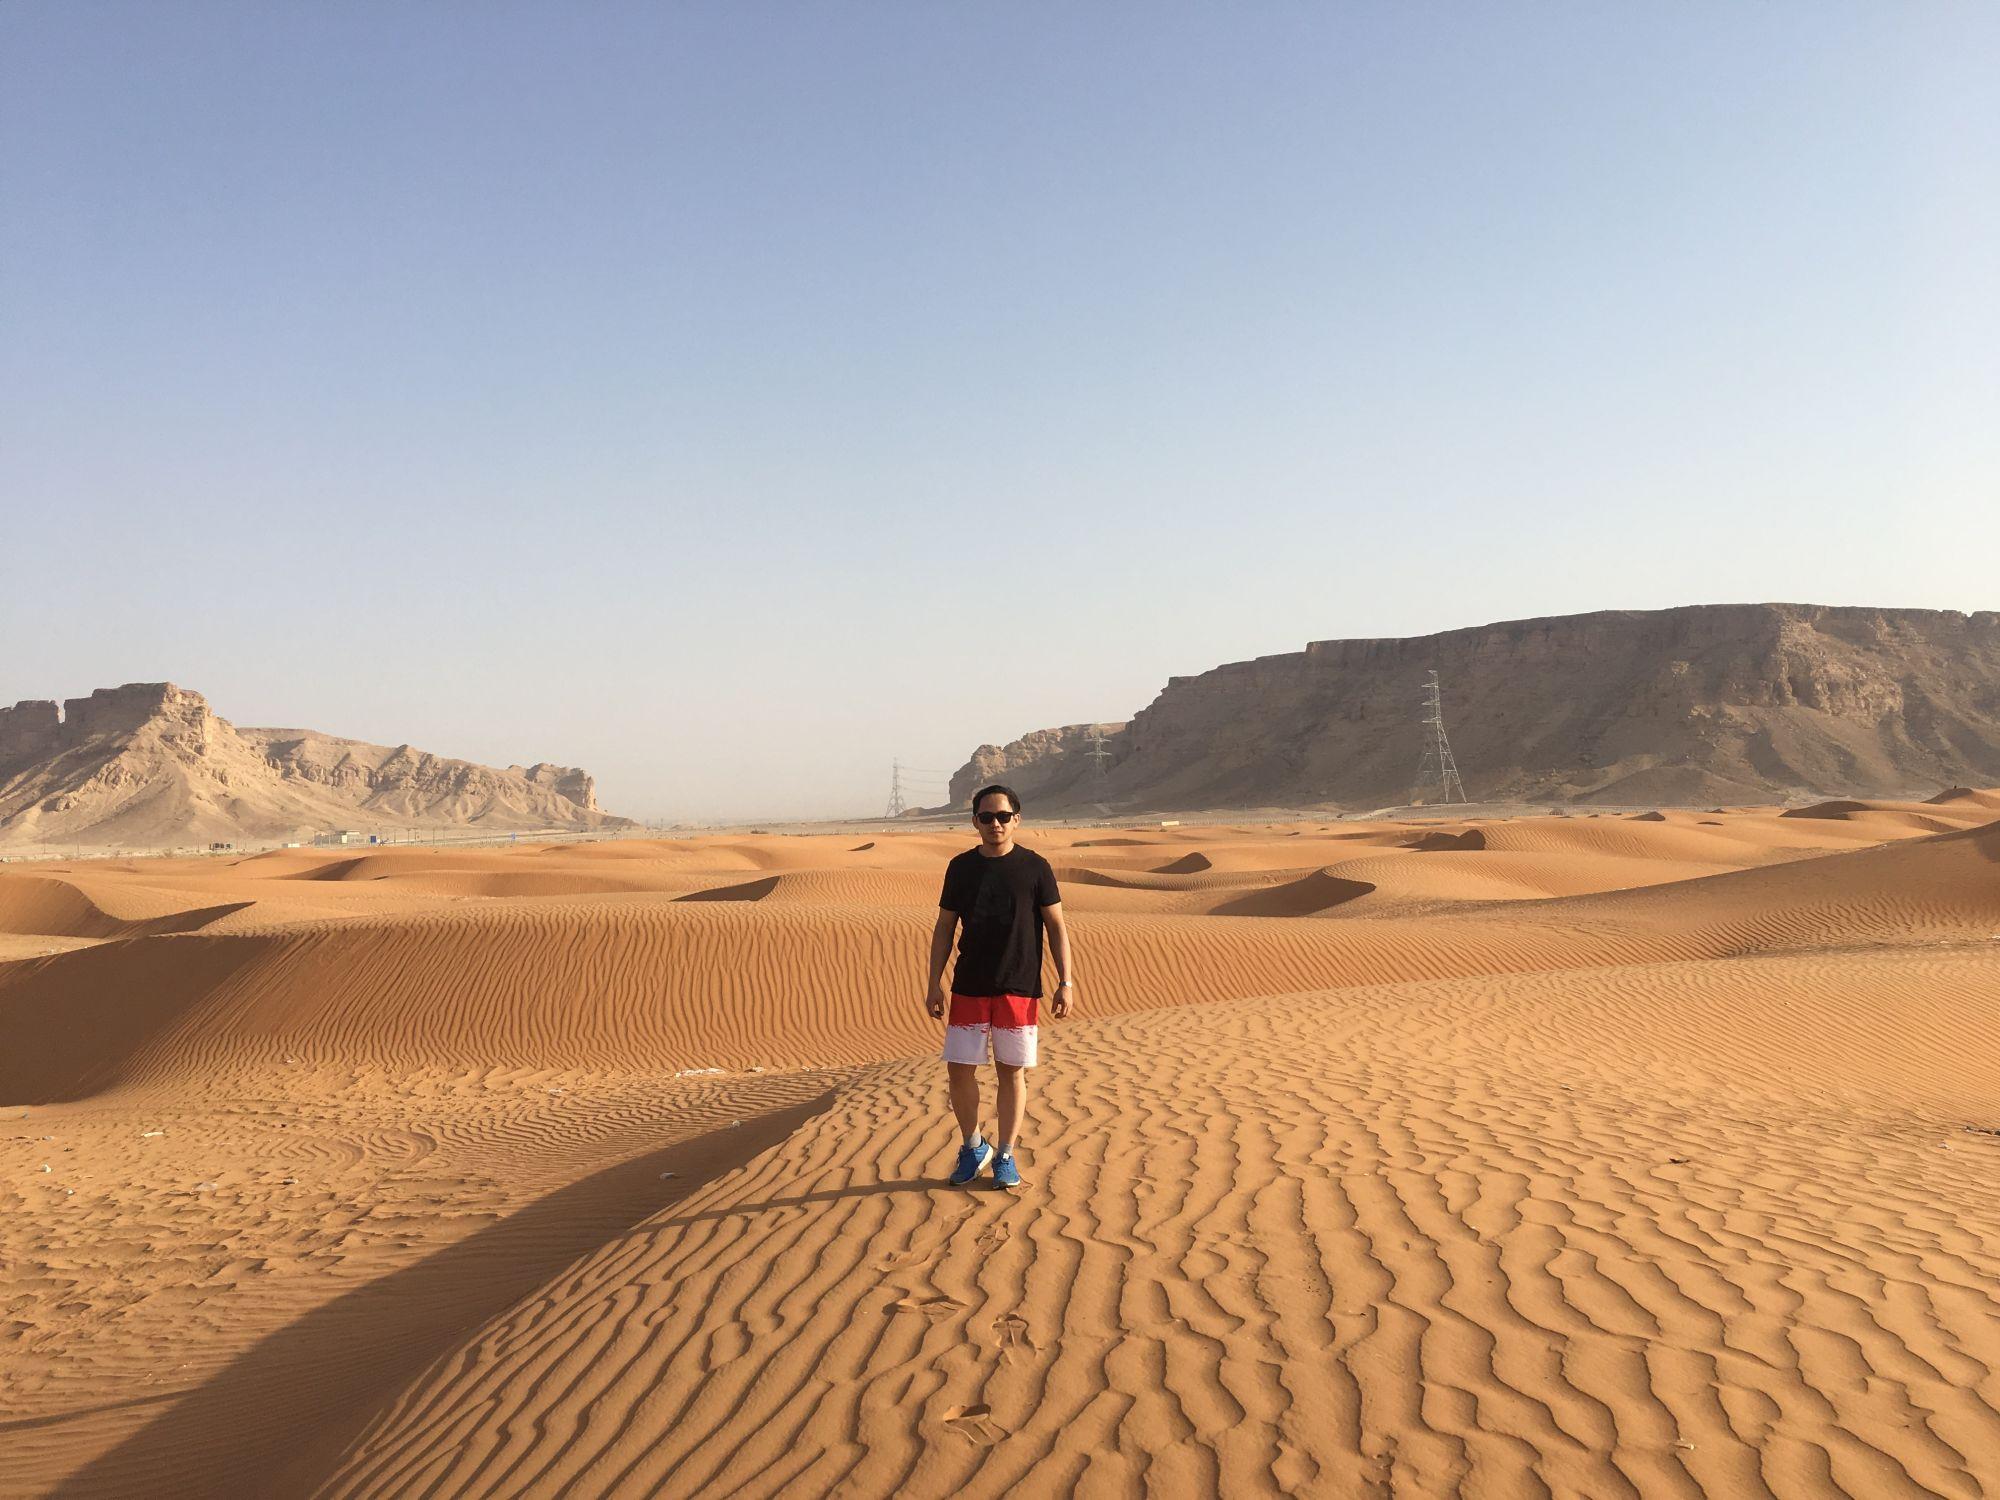 Expatriates Jeddah - Exploring Mars